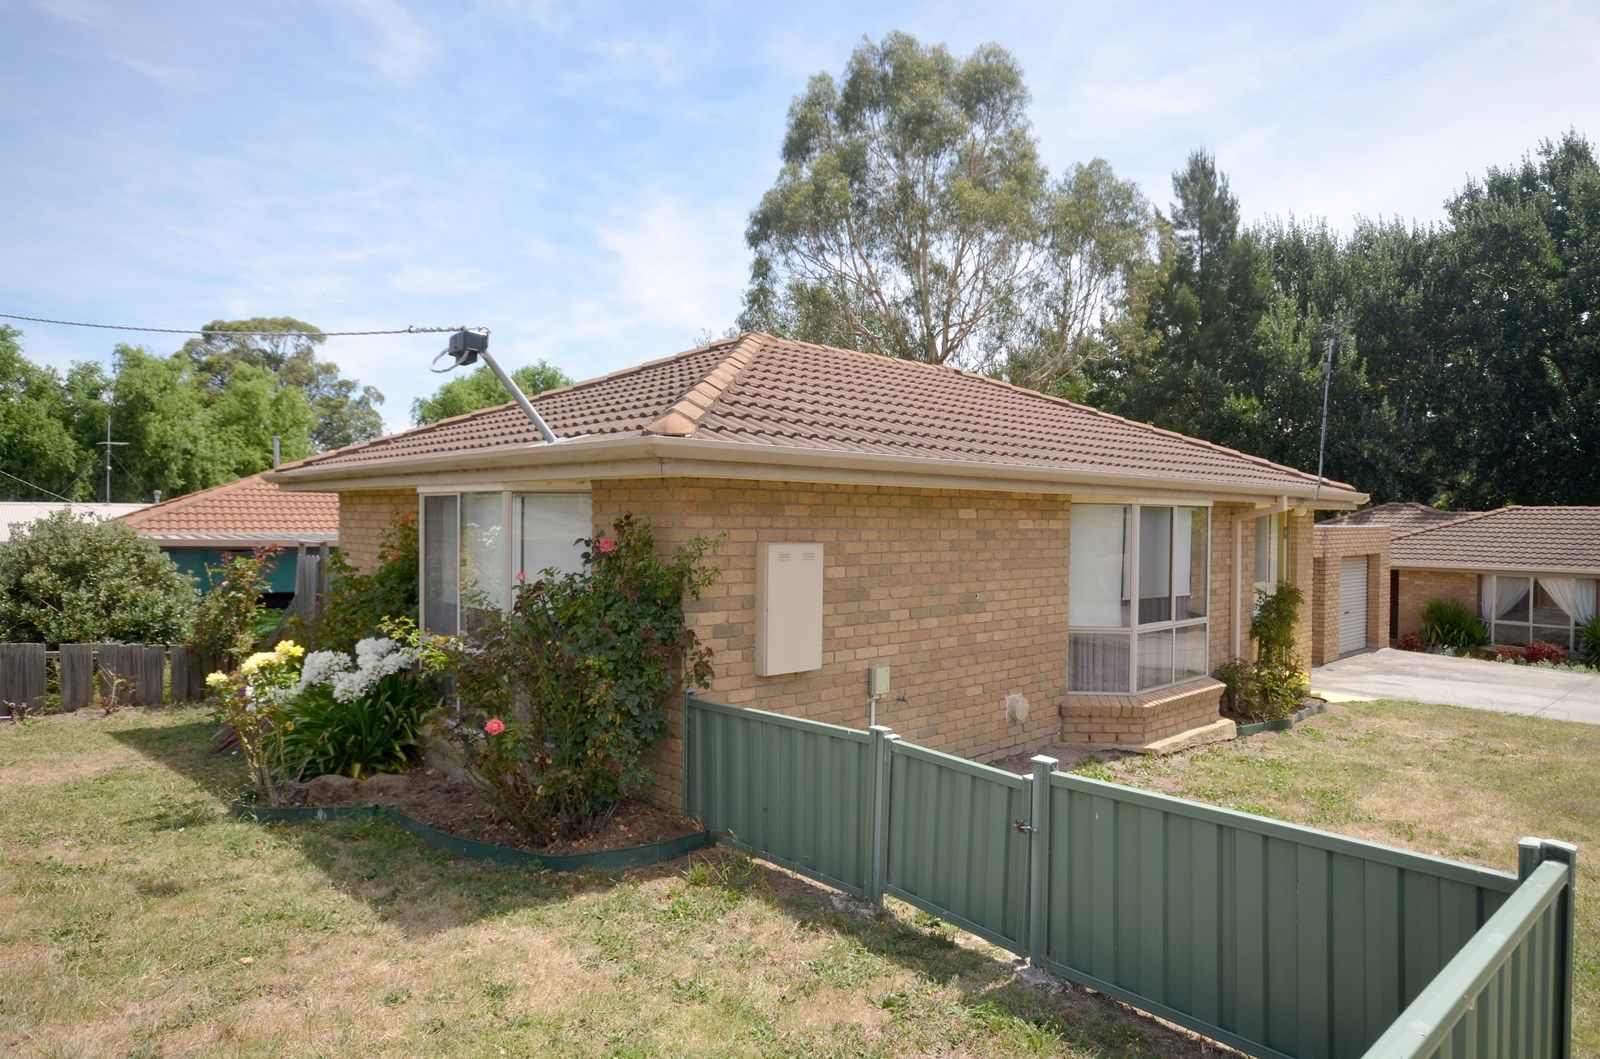 1/204 Larter Street, Ballarat East VIC 3350, Image 1